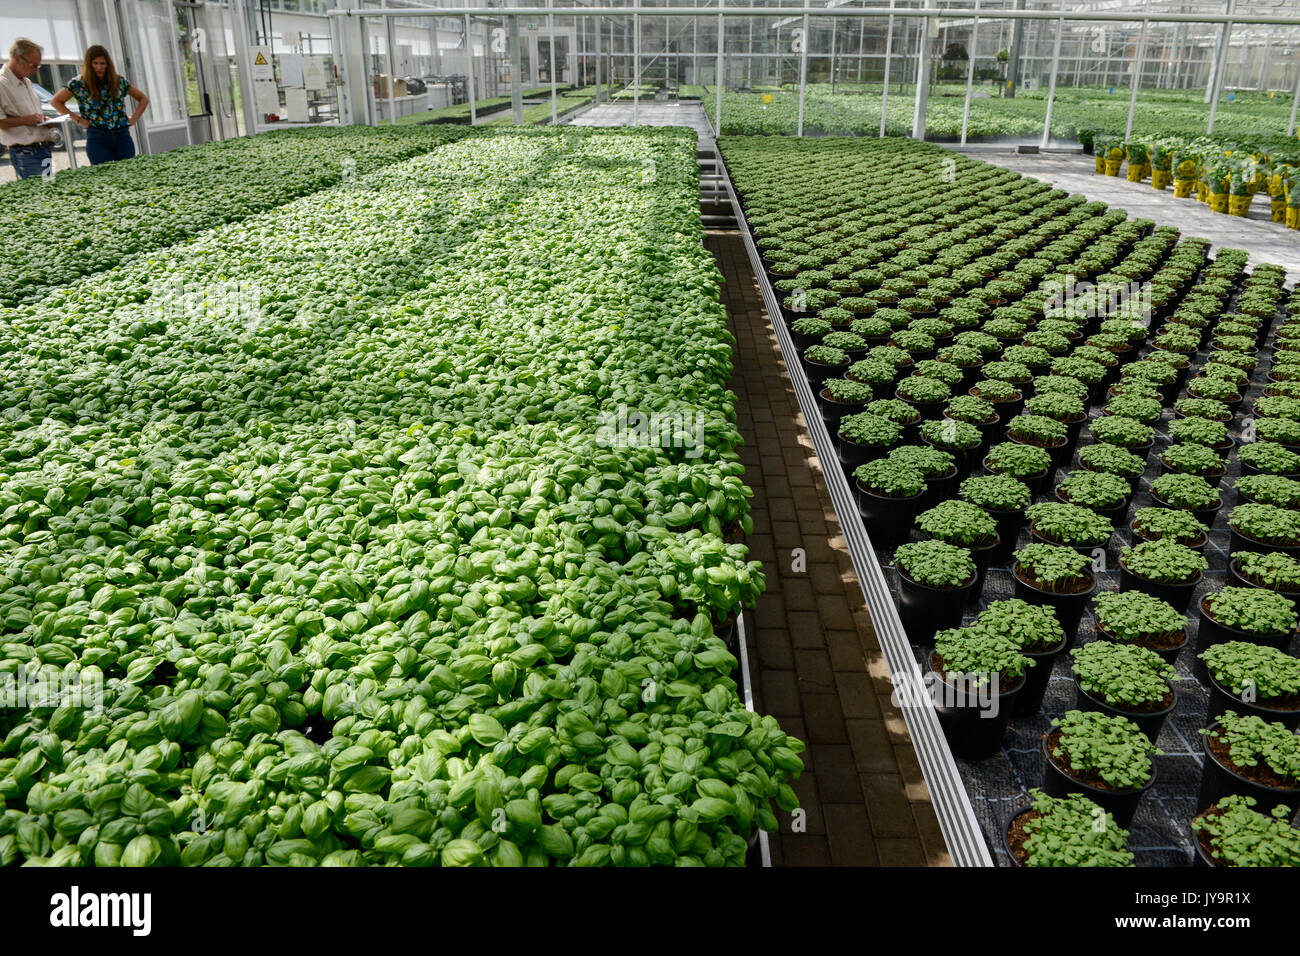 berlin germany urban gardening in stock photos berlin germany urban gardening in stock images. Black Bedroom Furniture Sets. Home Design Ideas